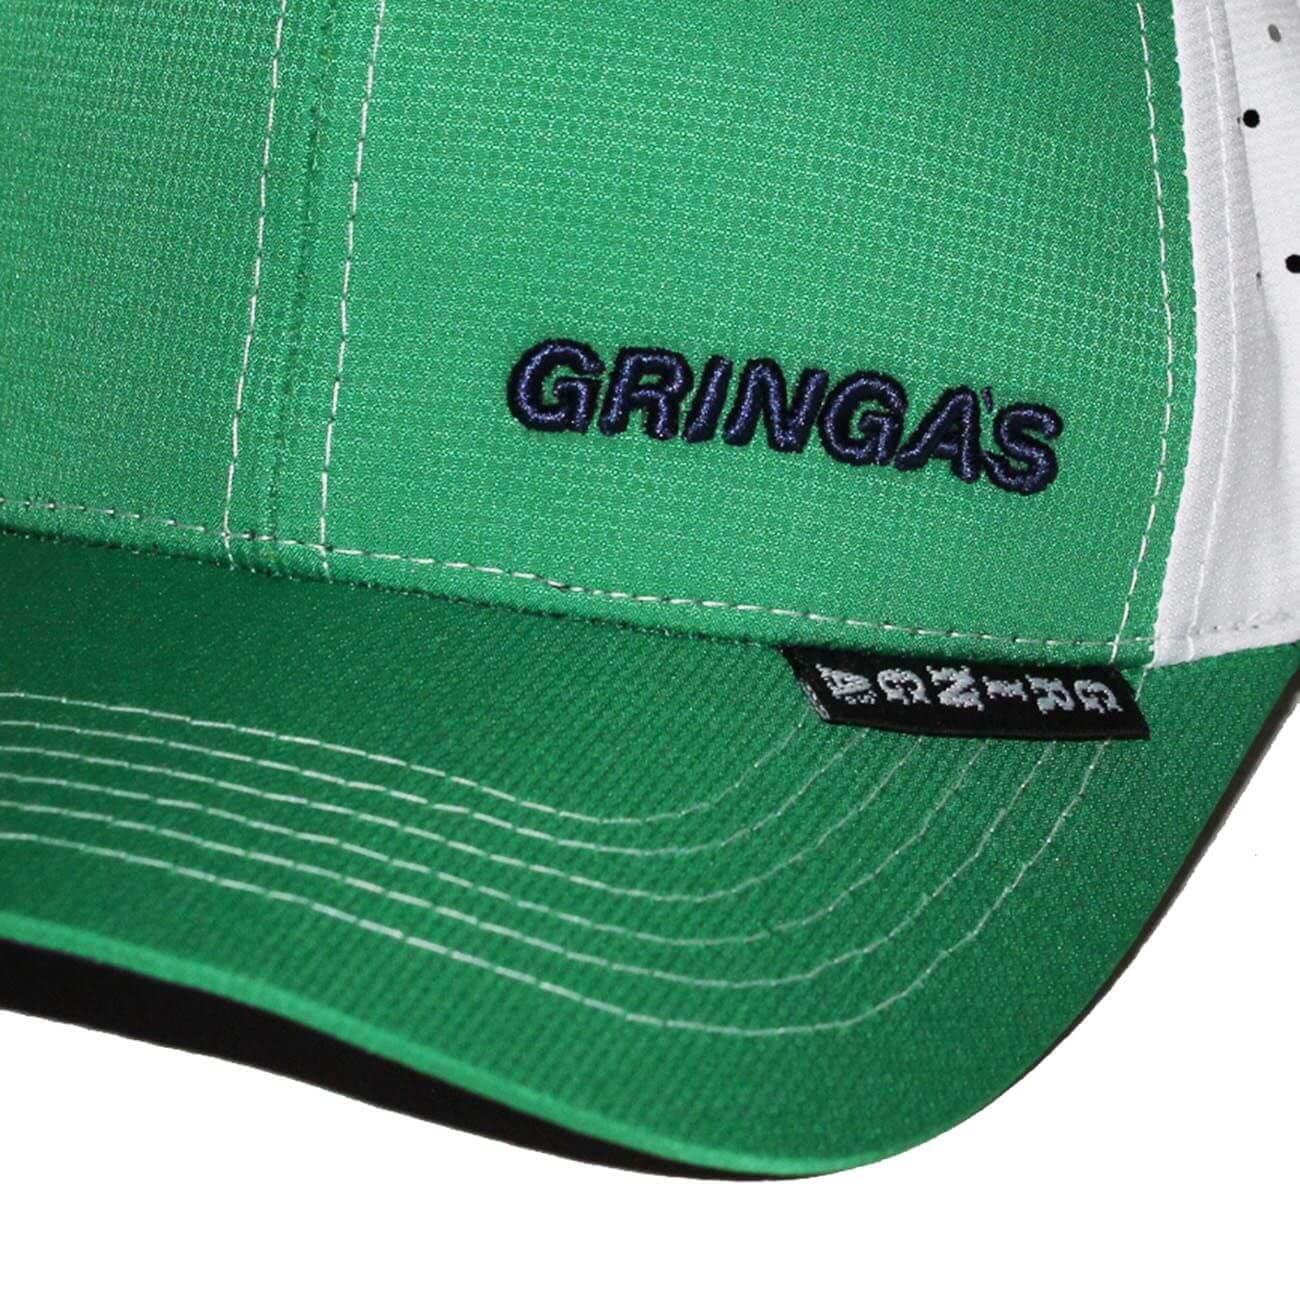 Boné Aba Curva Tech Fit Green Gringa s  9f9c5673c1a